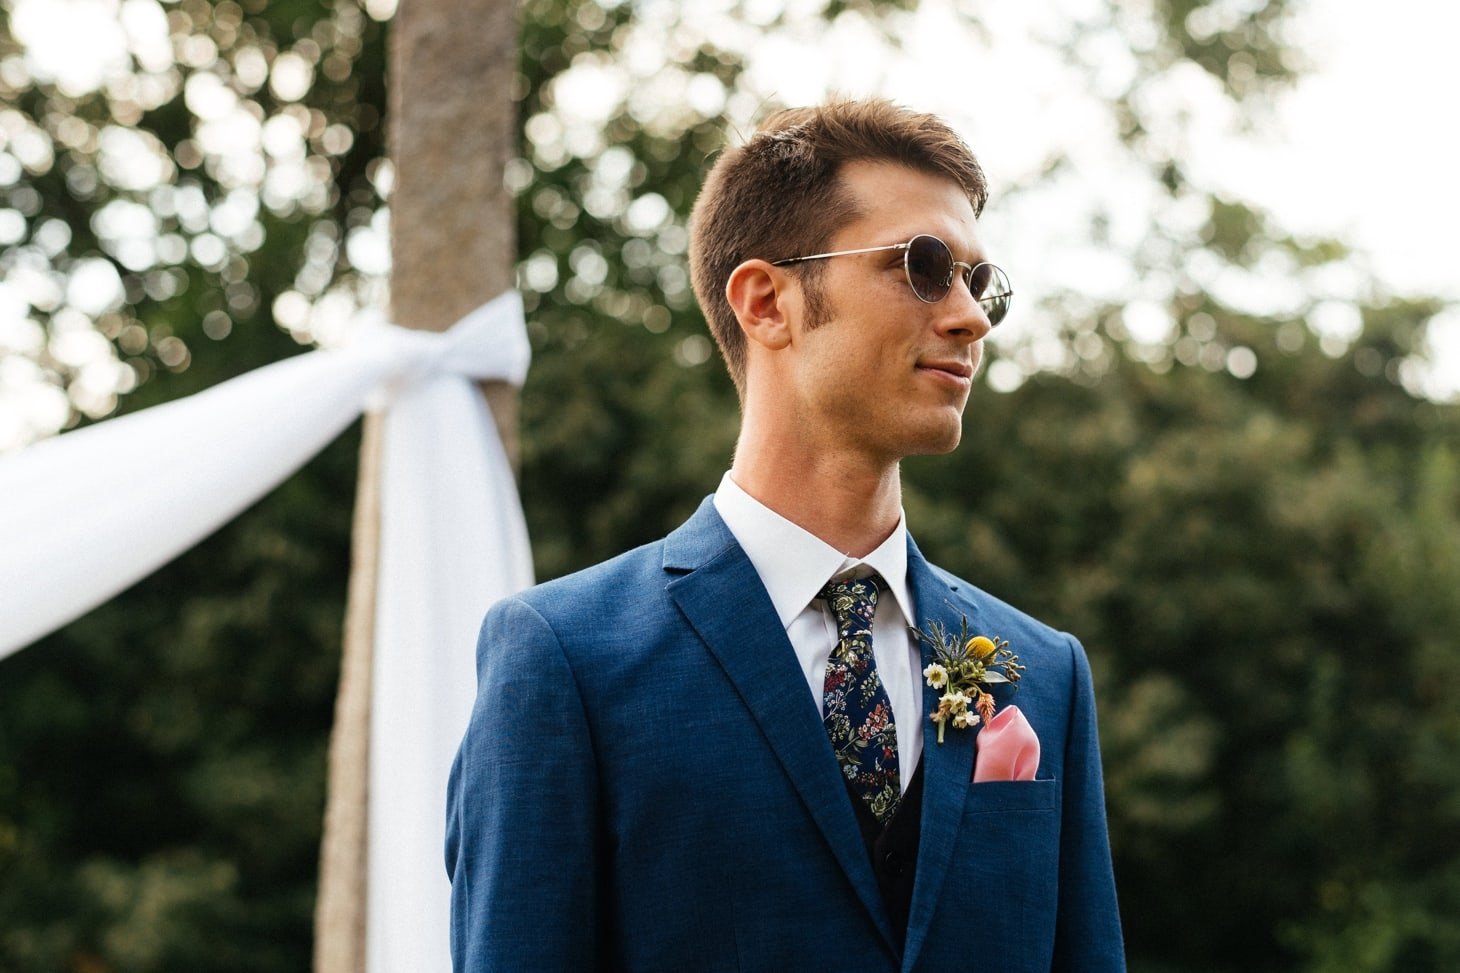 groom at ceremony at harvest preserve